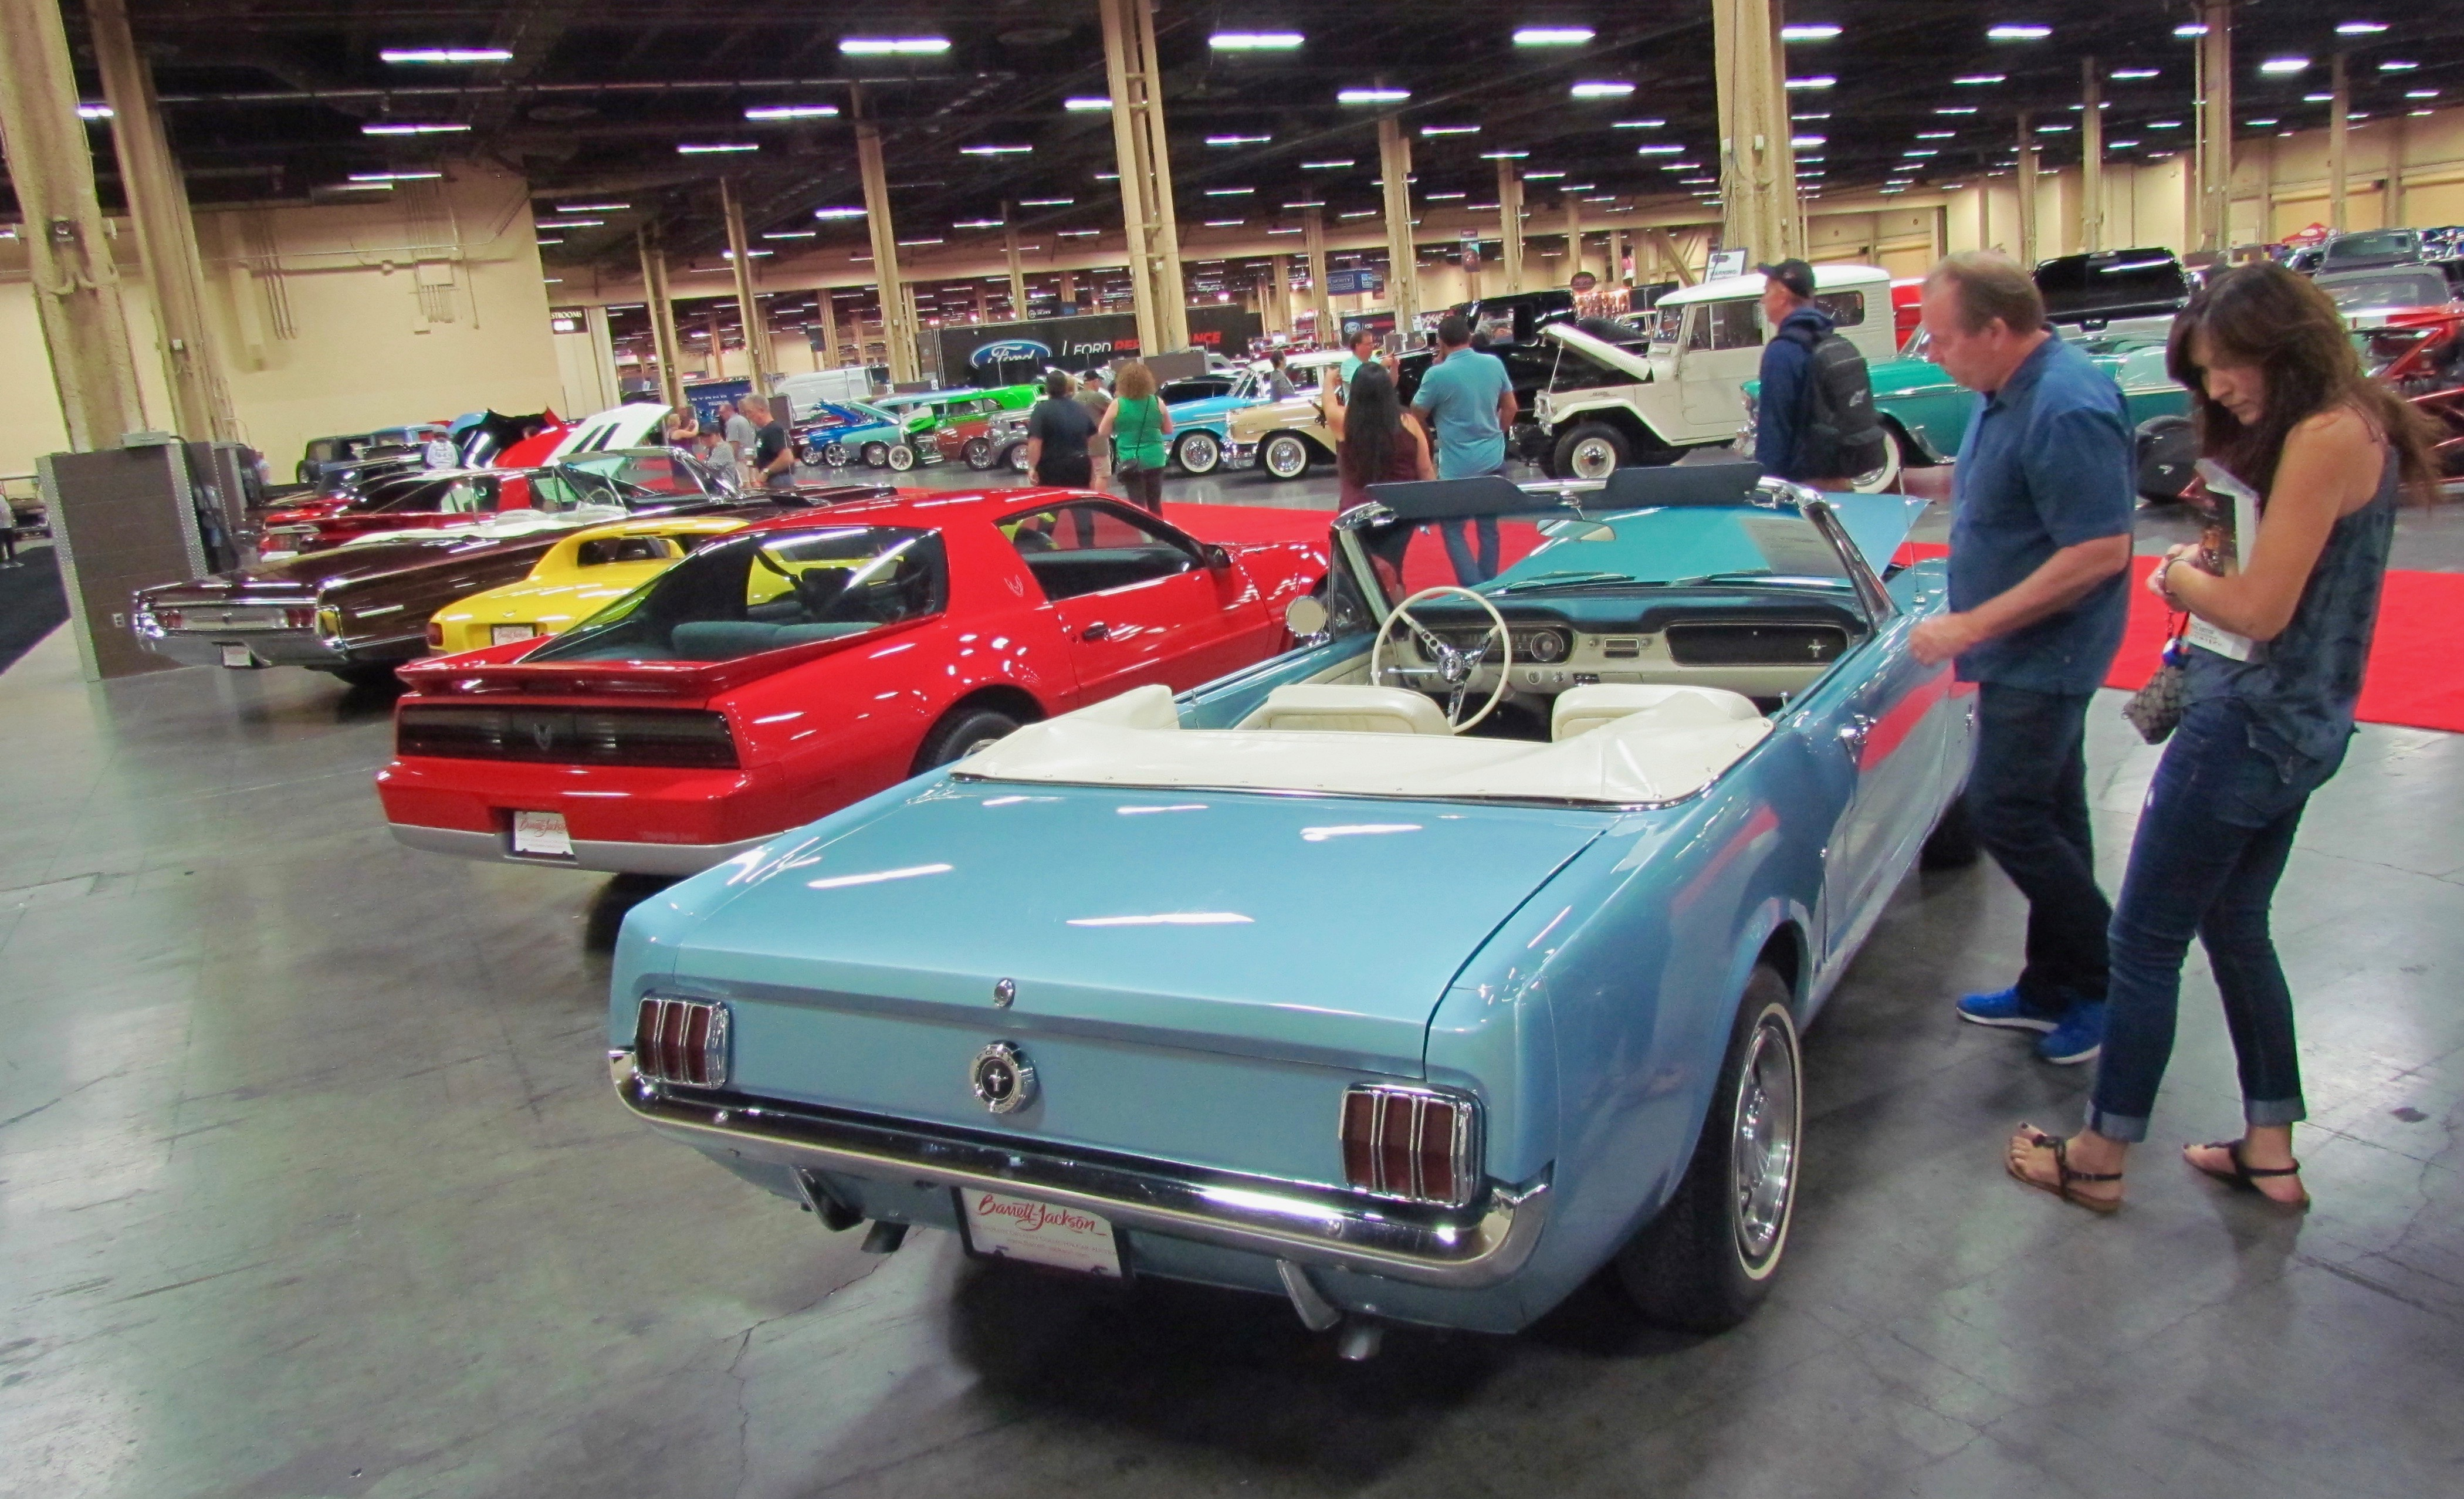 Larrys Likes At BarrettJacksons Las Vegas Auction ClassicCars - Barrett jackson car show las vegas